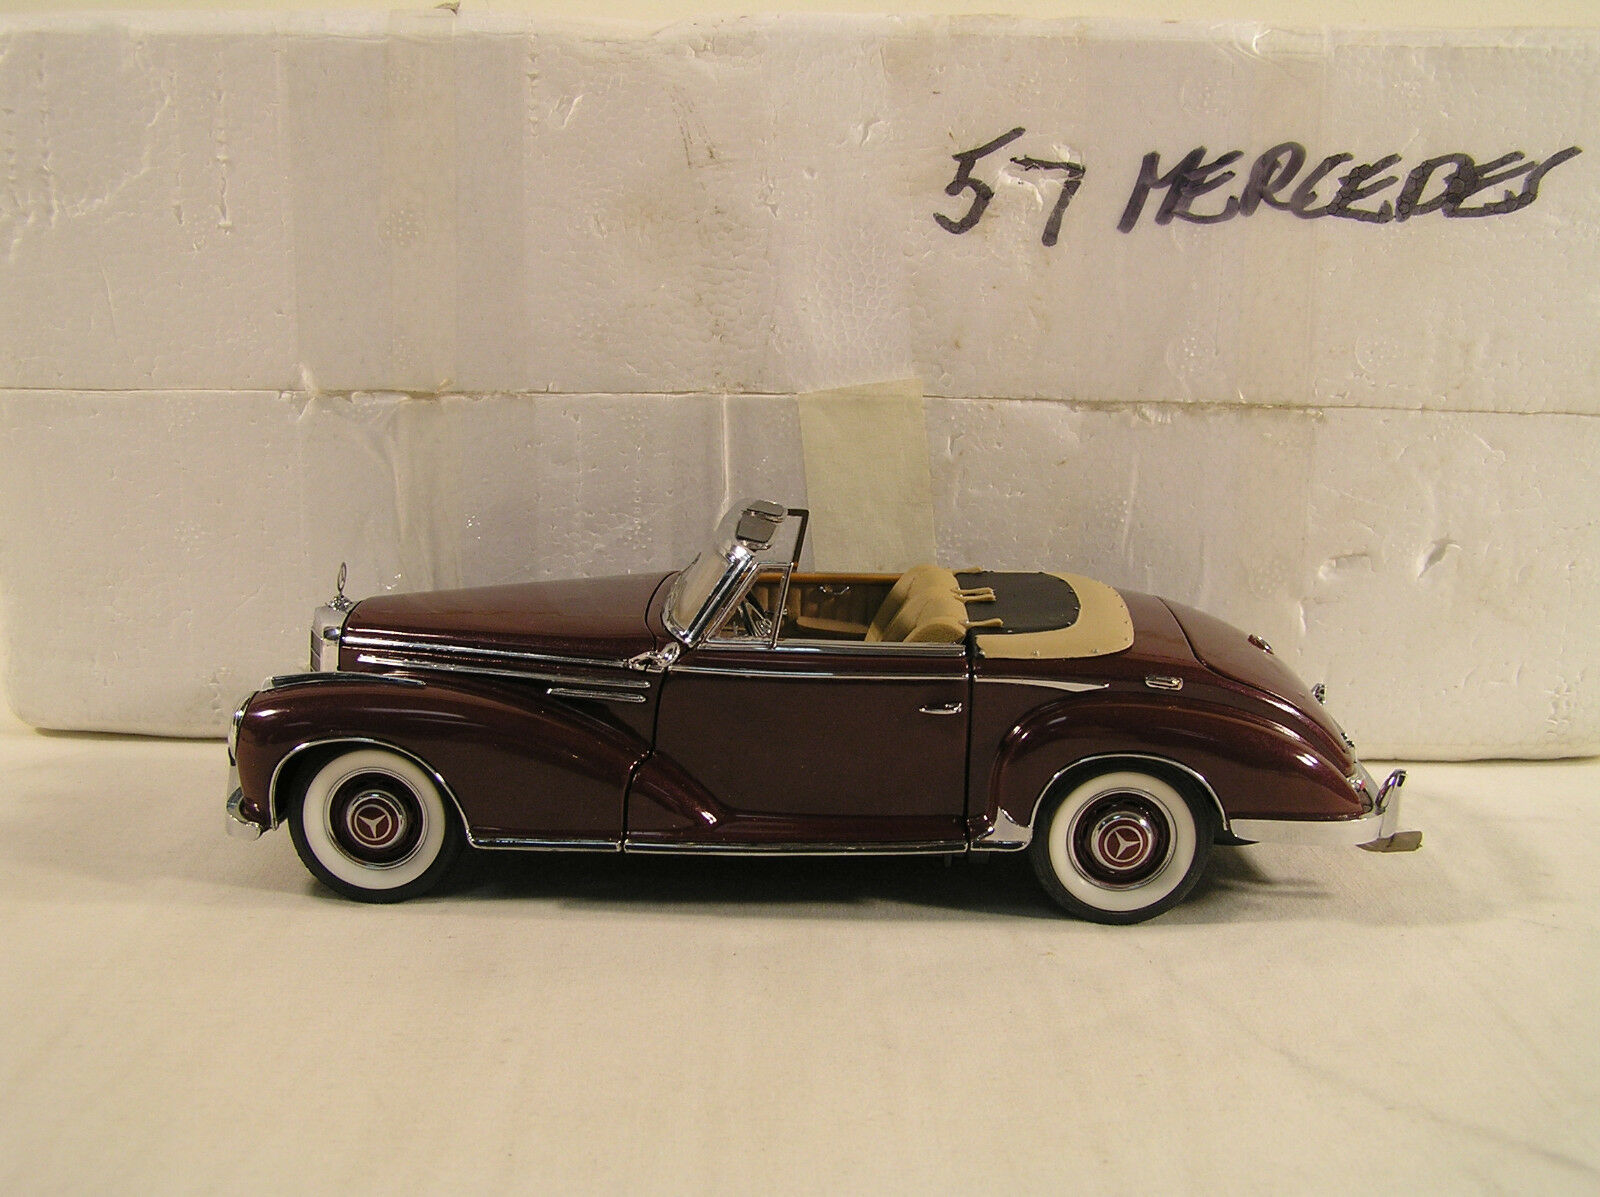 1957 Mercedes 330c by Franklin Mint, B11UG29